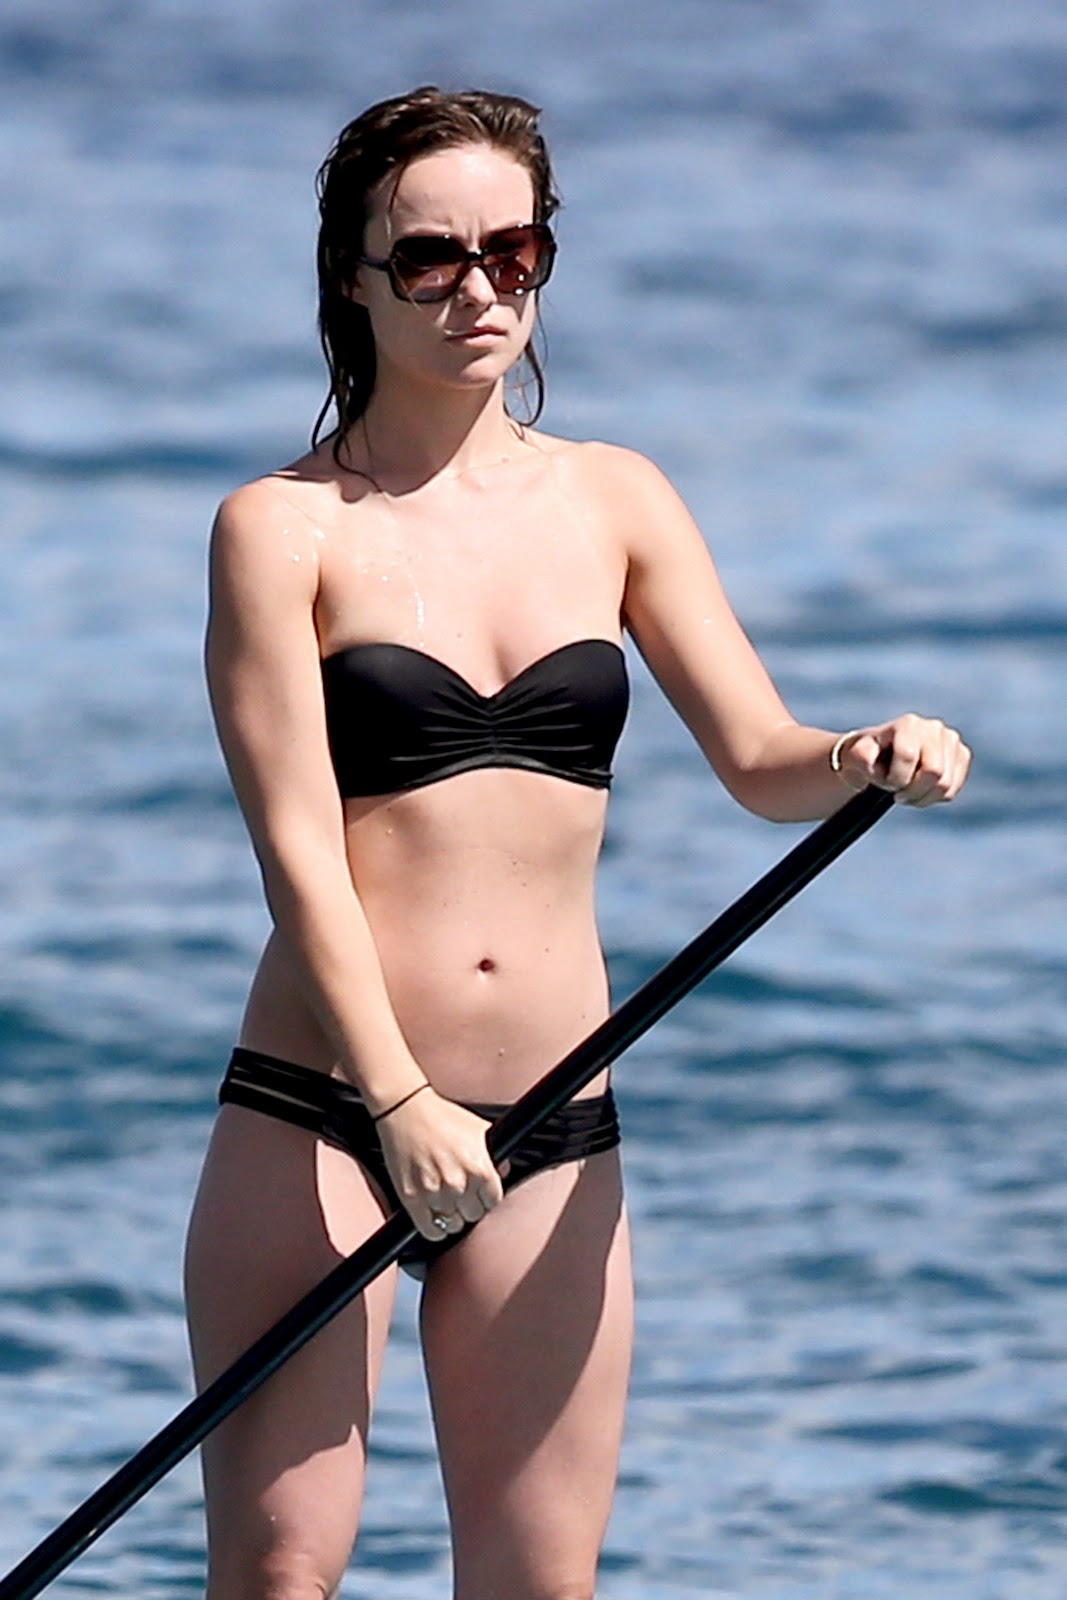 Olivia Wilde Bikini Bodies Pic 15 of 35